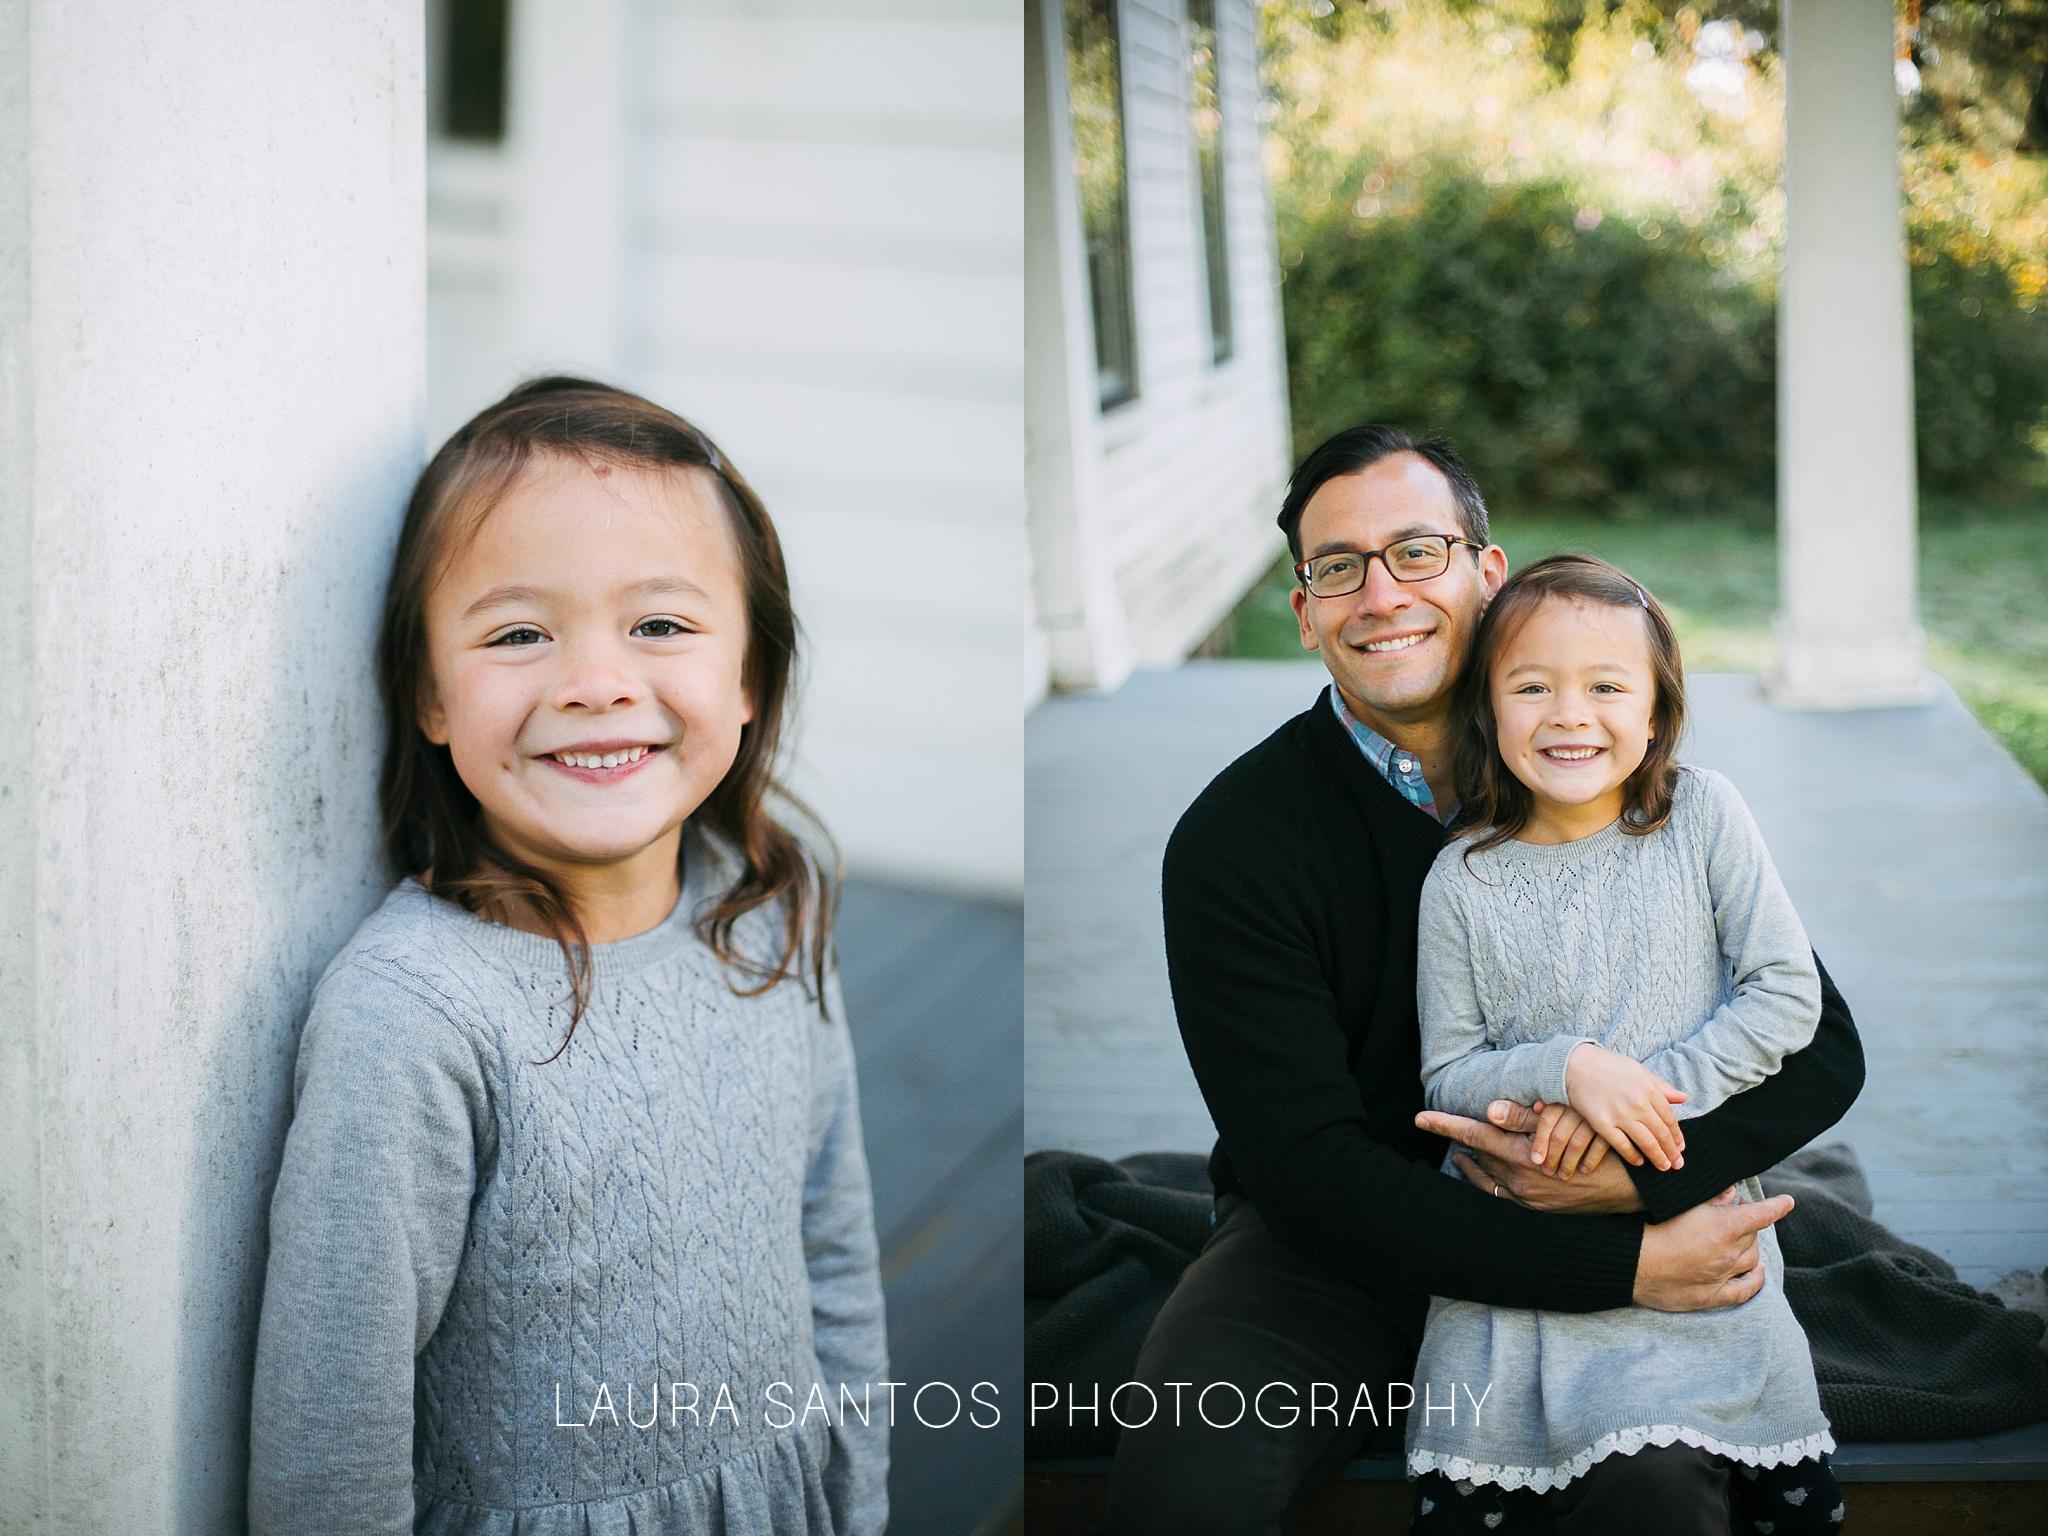 Laura Santos Photography Portland Oregon Family Photographer_0538.jpg